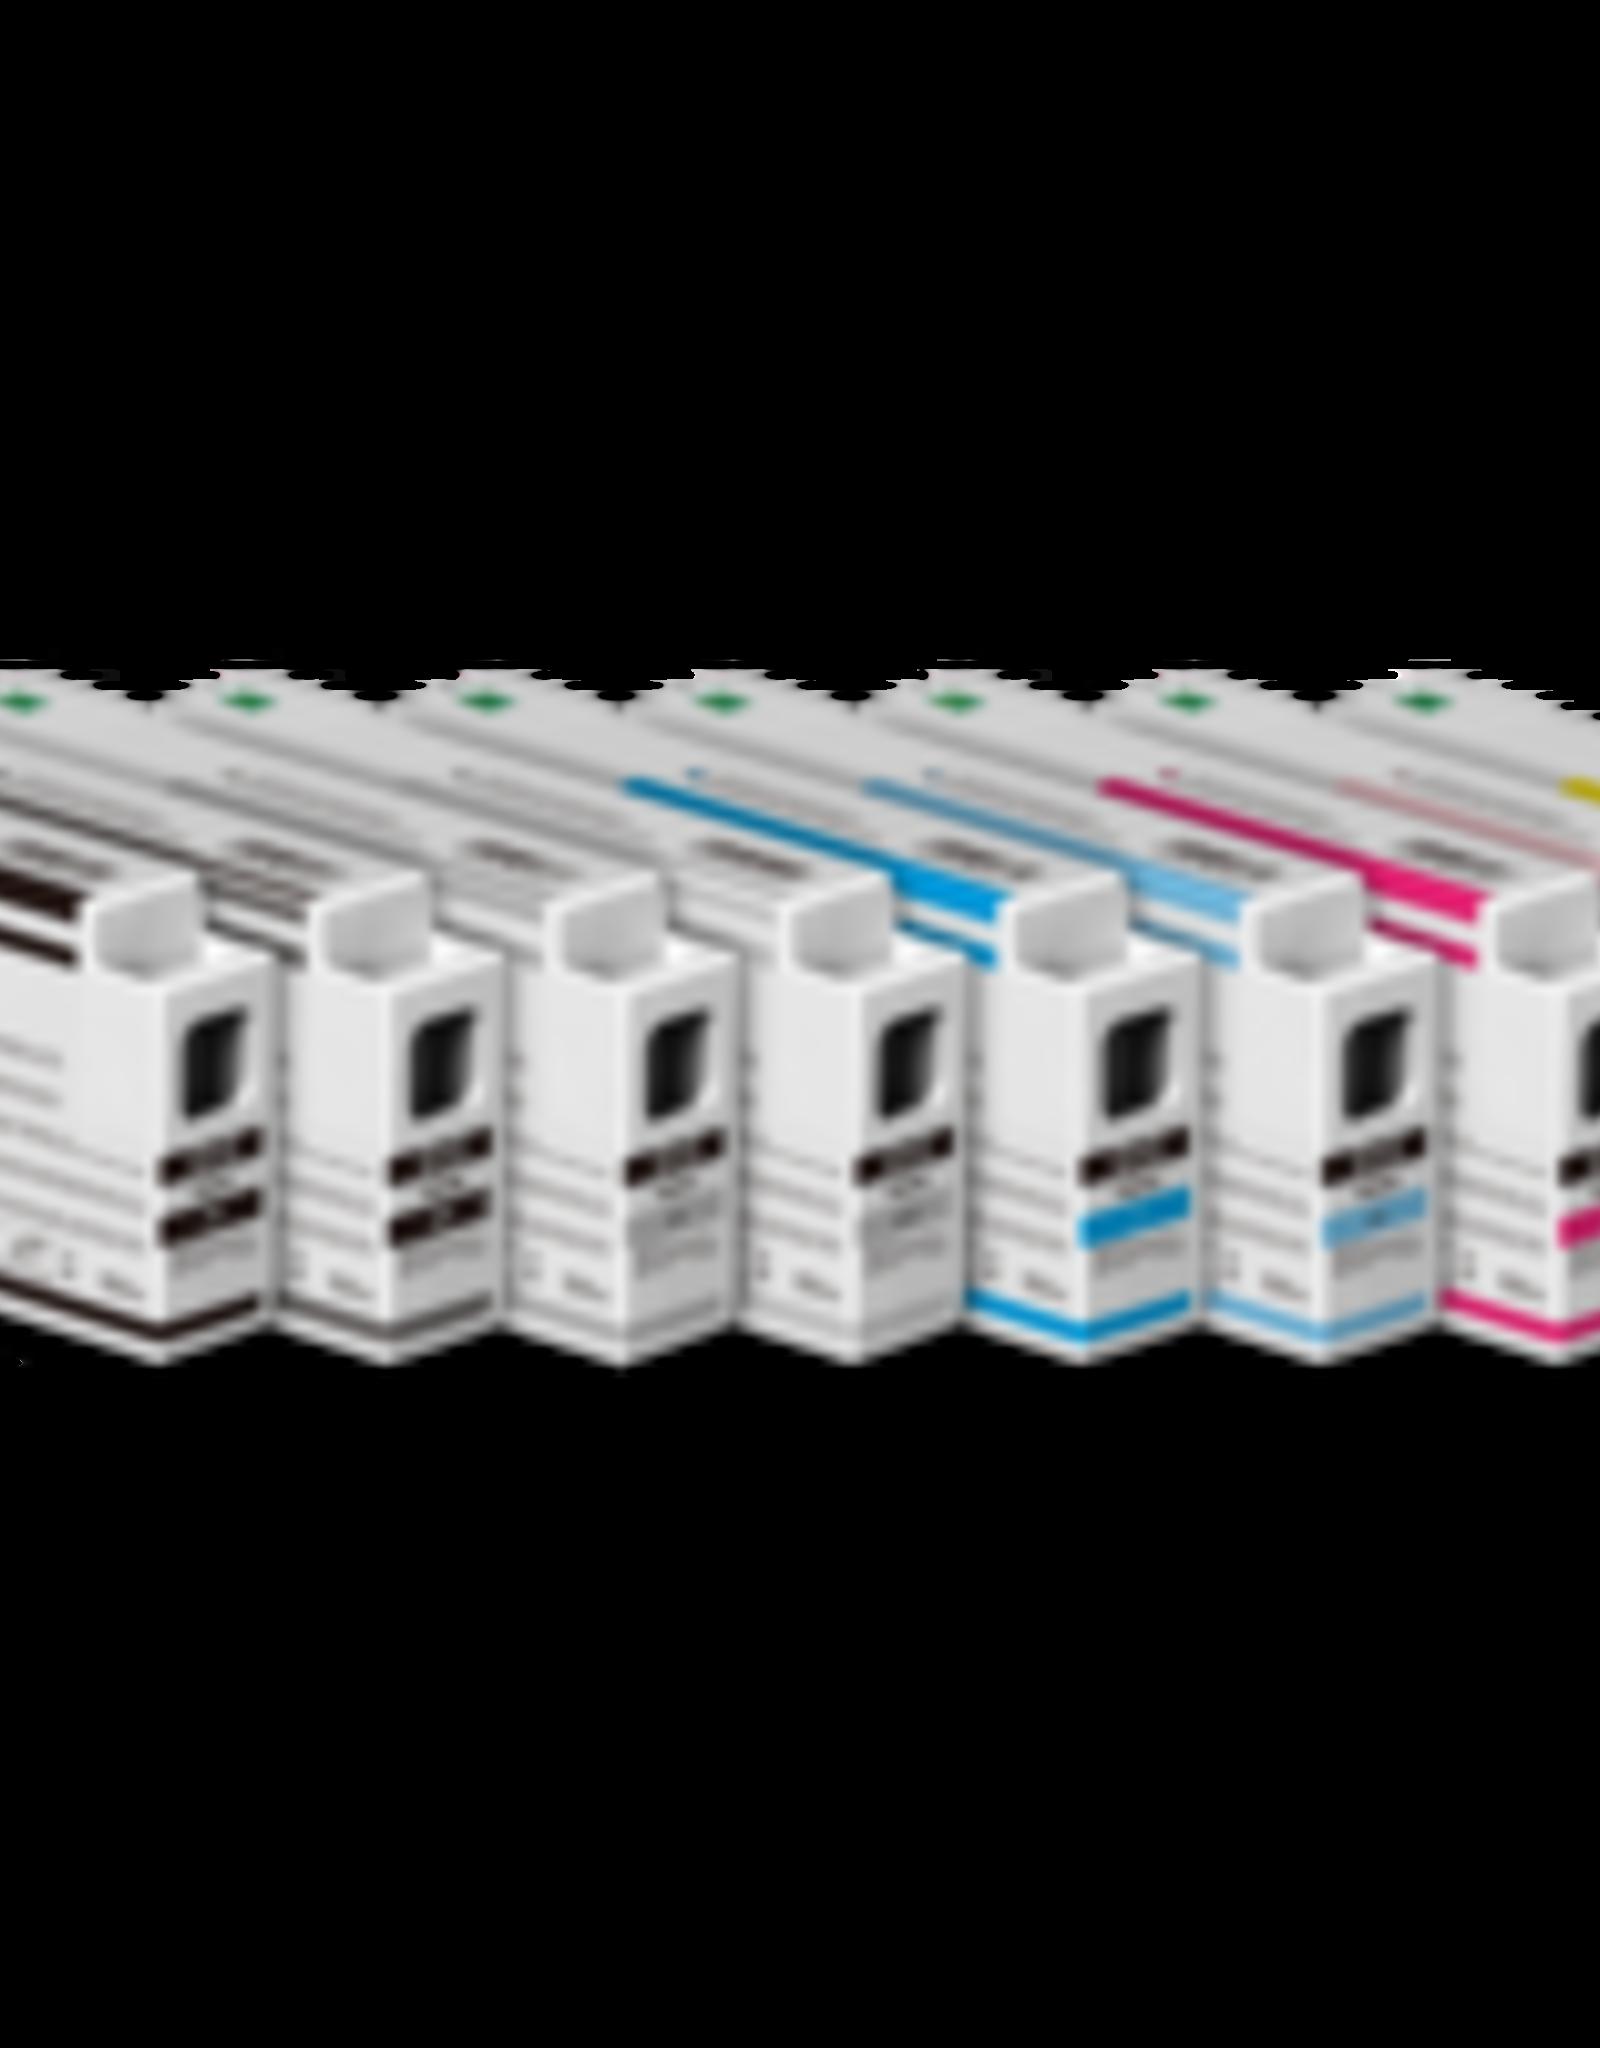 Epson Epson Ultrachrome HD Vivid Magenta Ink 350ML for SC-P7000/9000